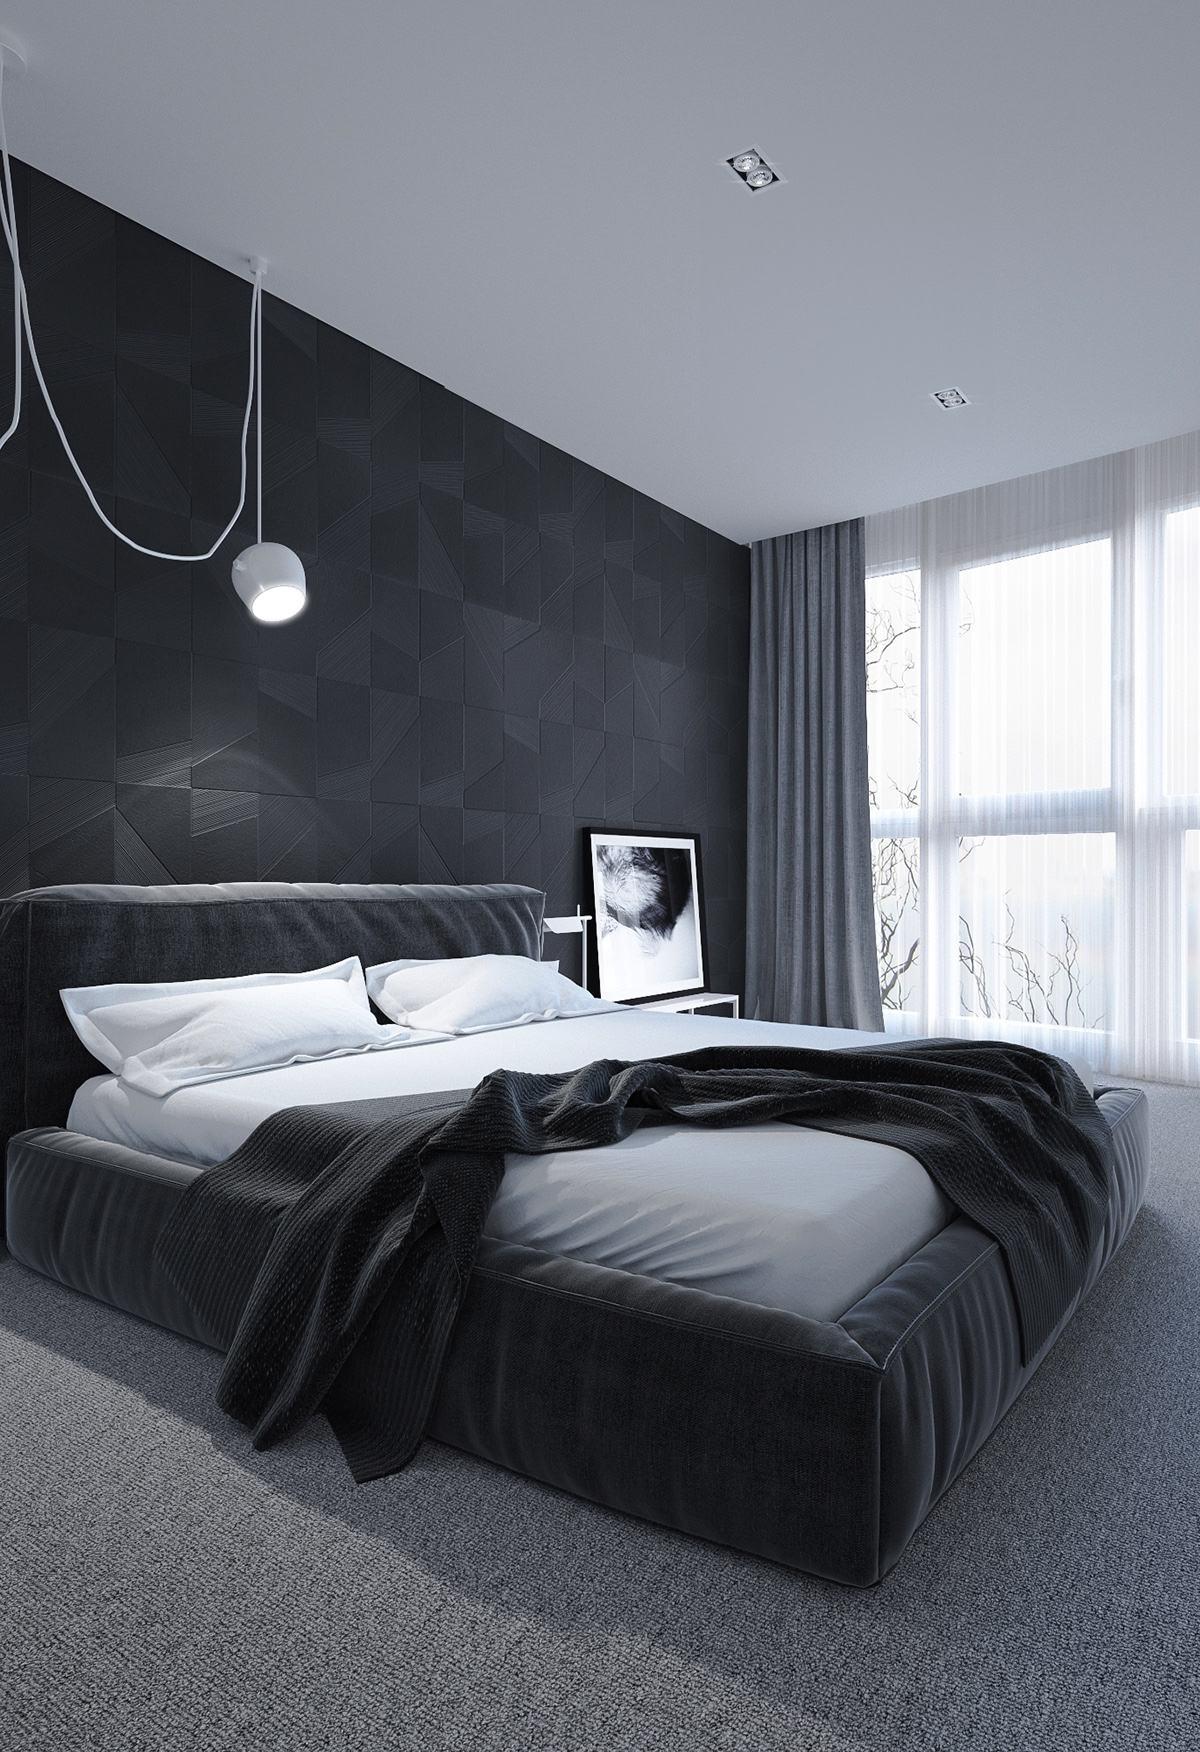 black-and-white-bedroom-design